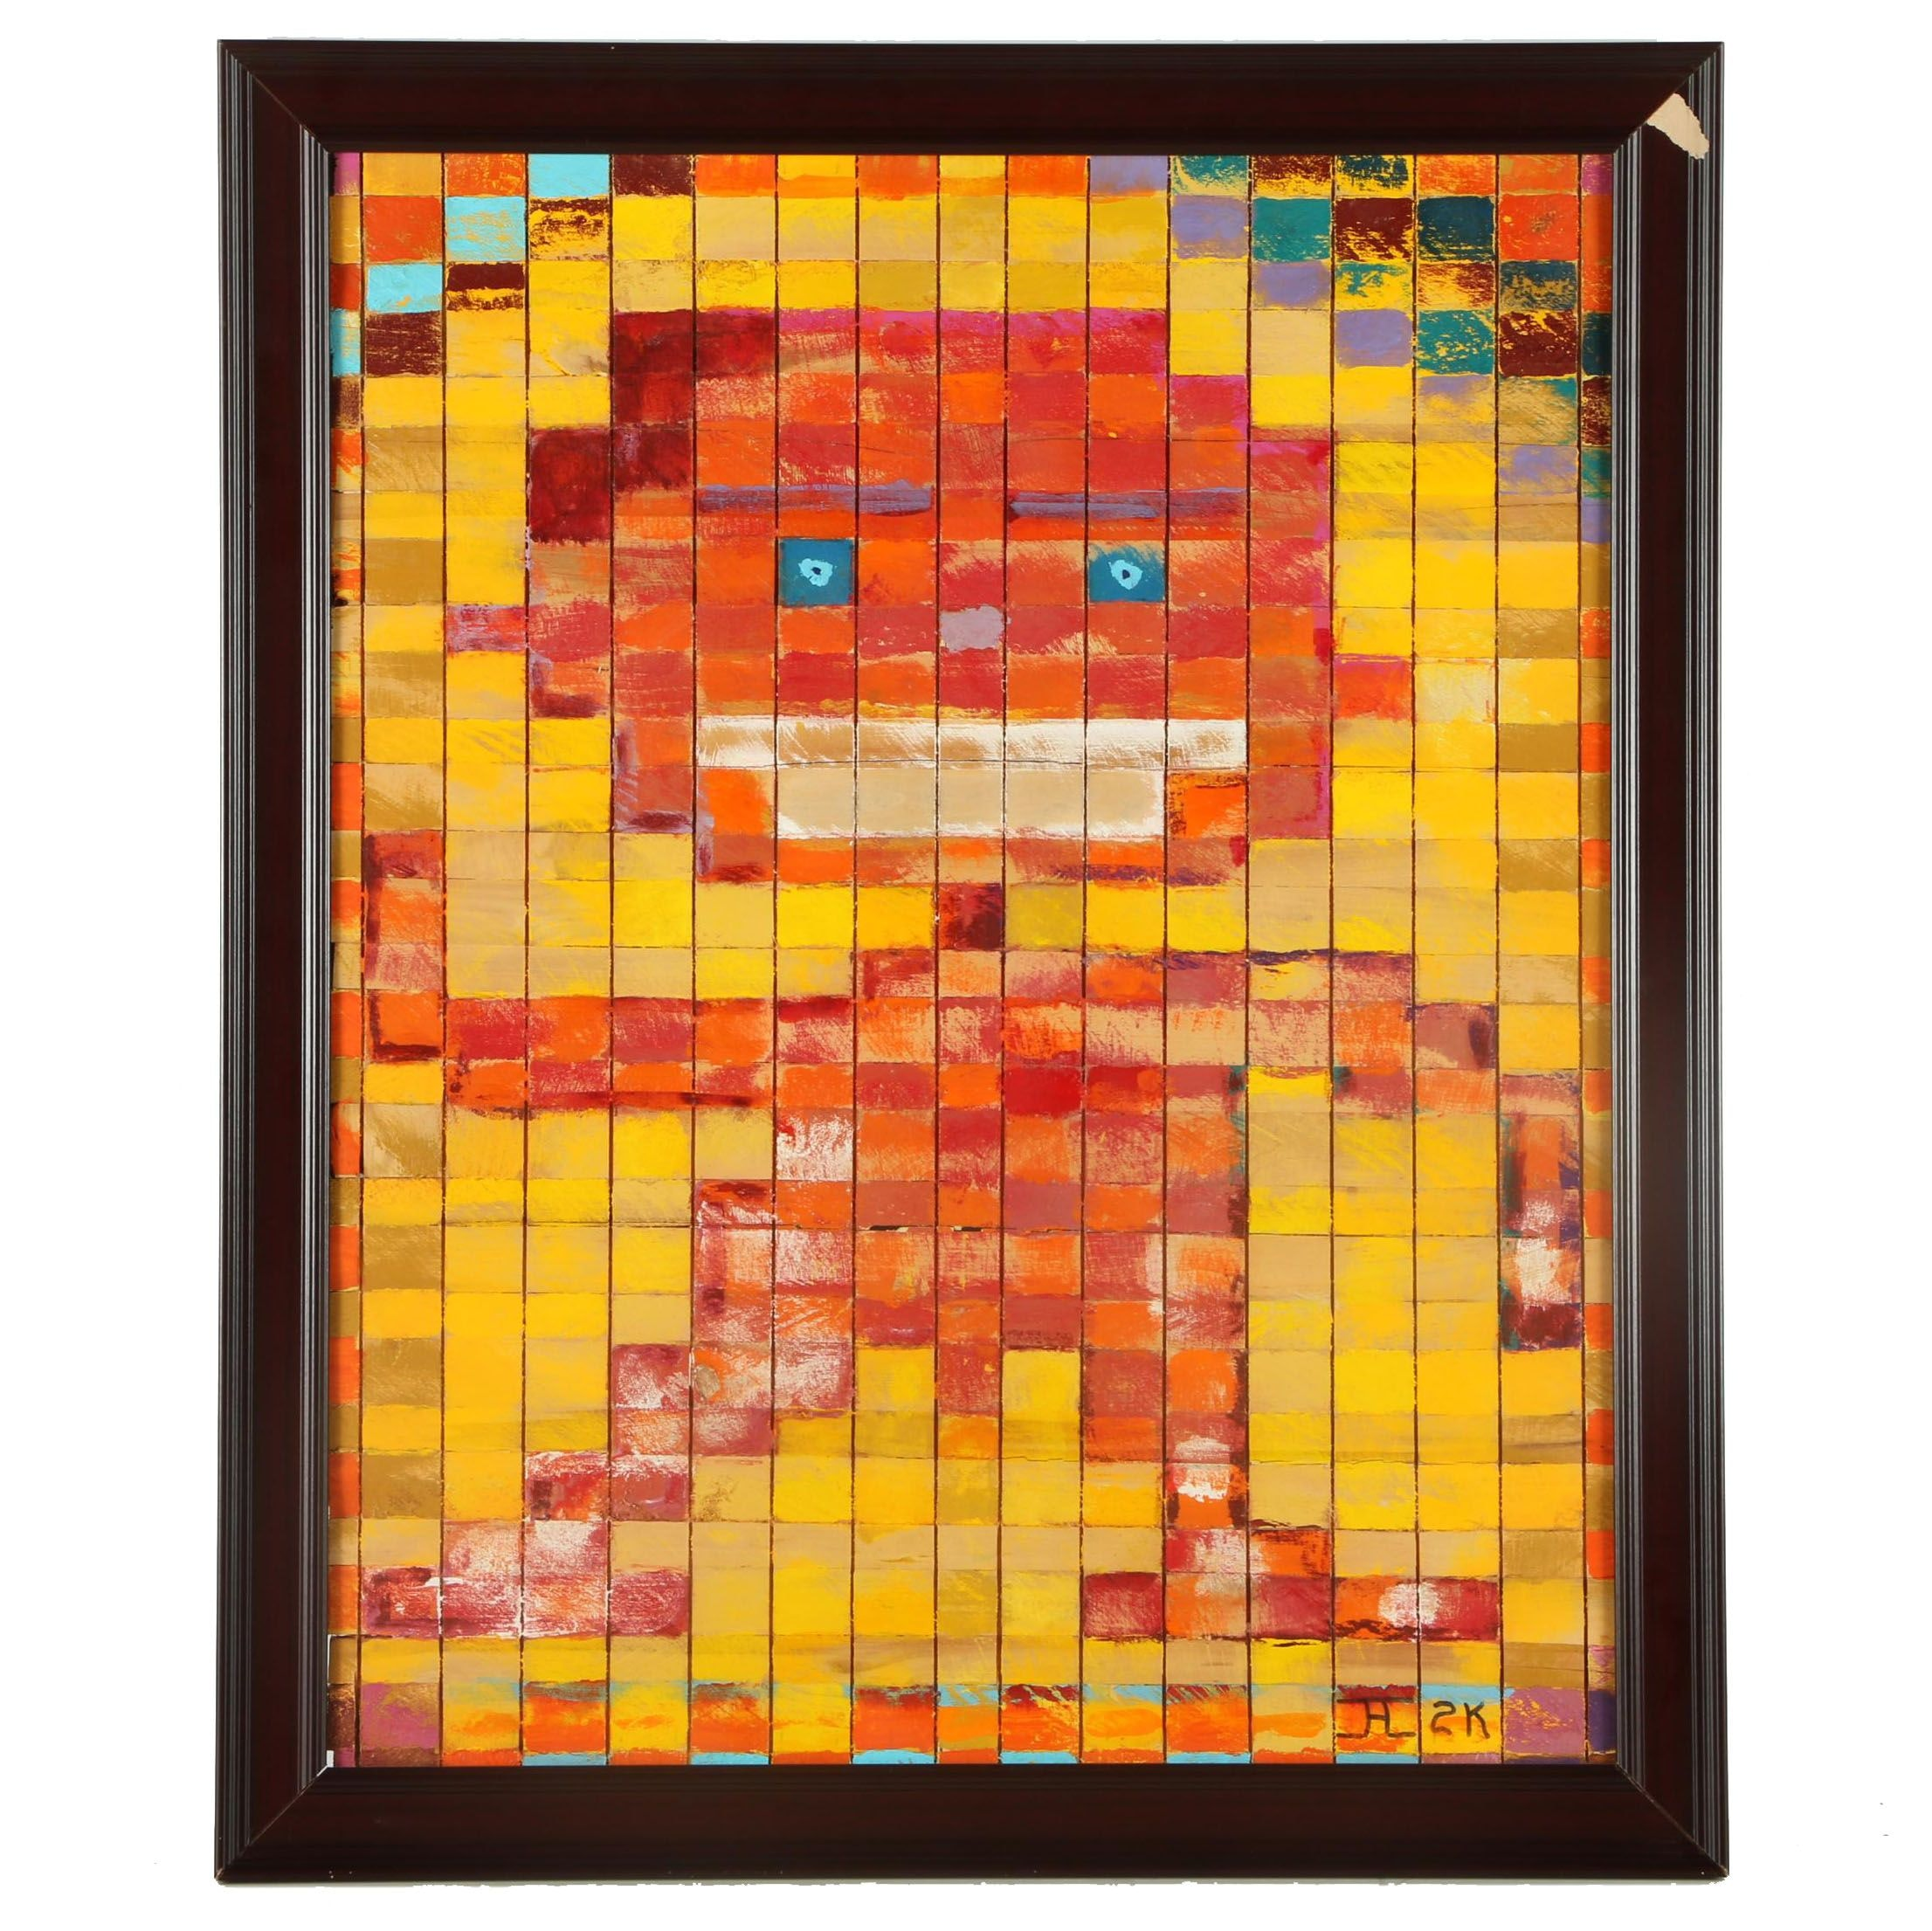 "Caviness Acrylic Painting on Wood Blocks ""Laughing Boy"""